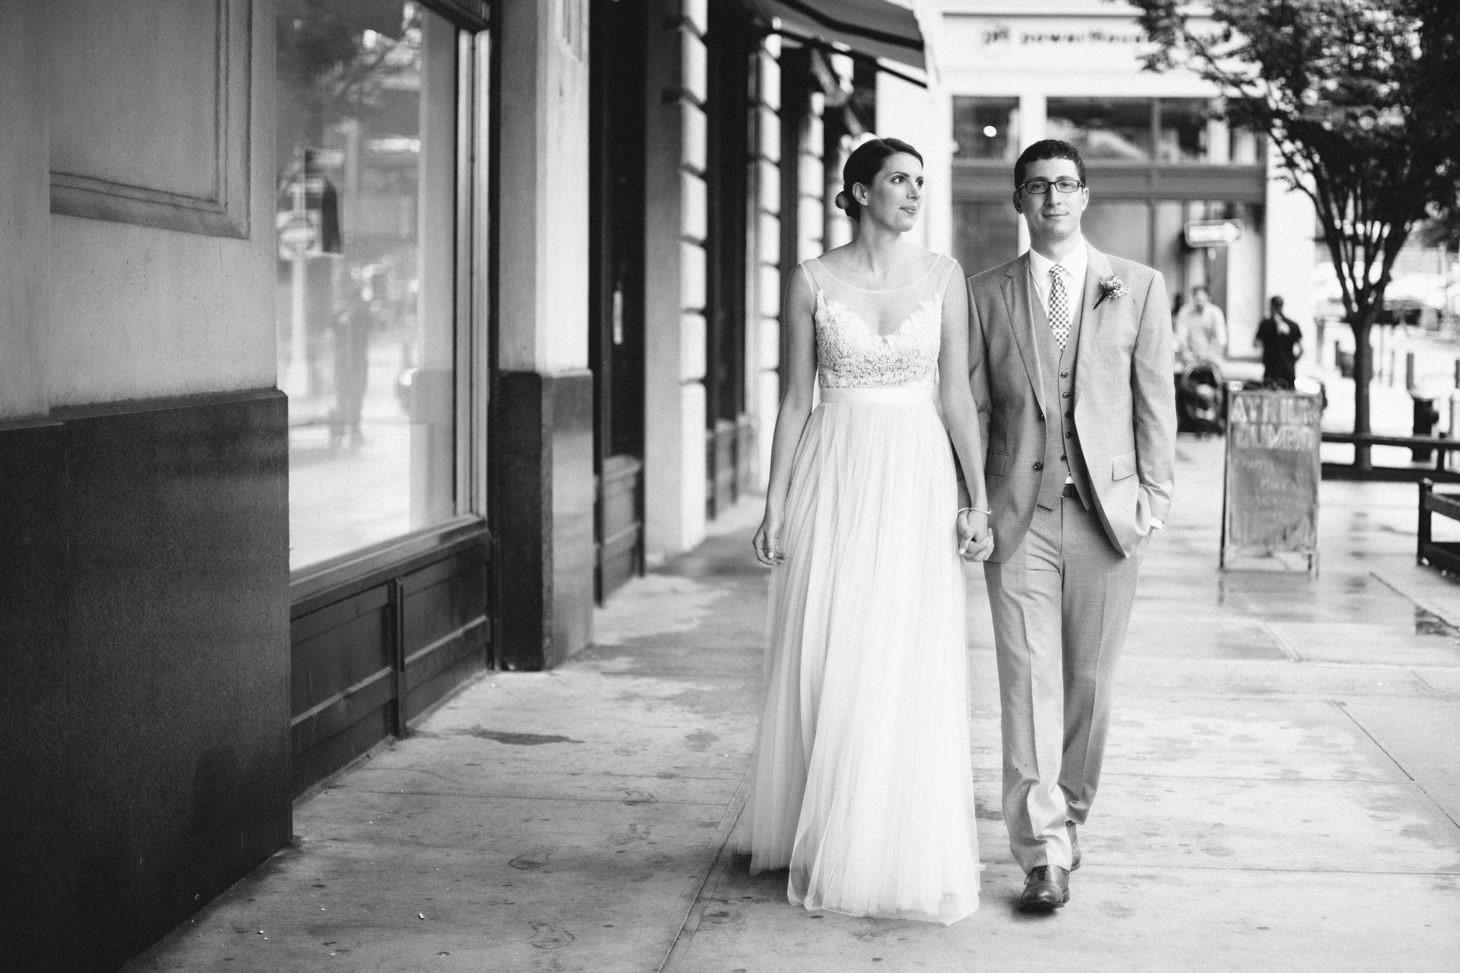 008-nyc-dumbo-loft-brooklyn-wedding-photographer-smitten-chickens-photo-.jpg